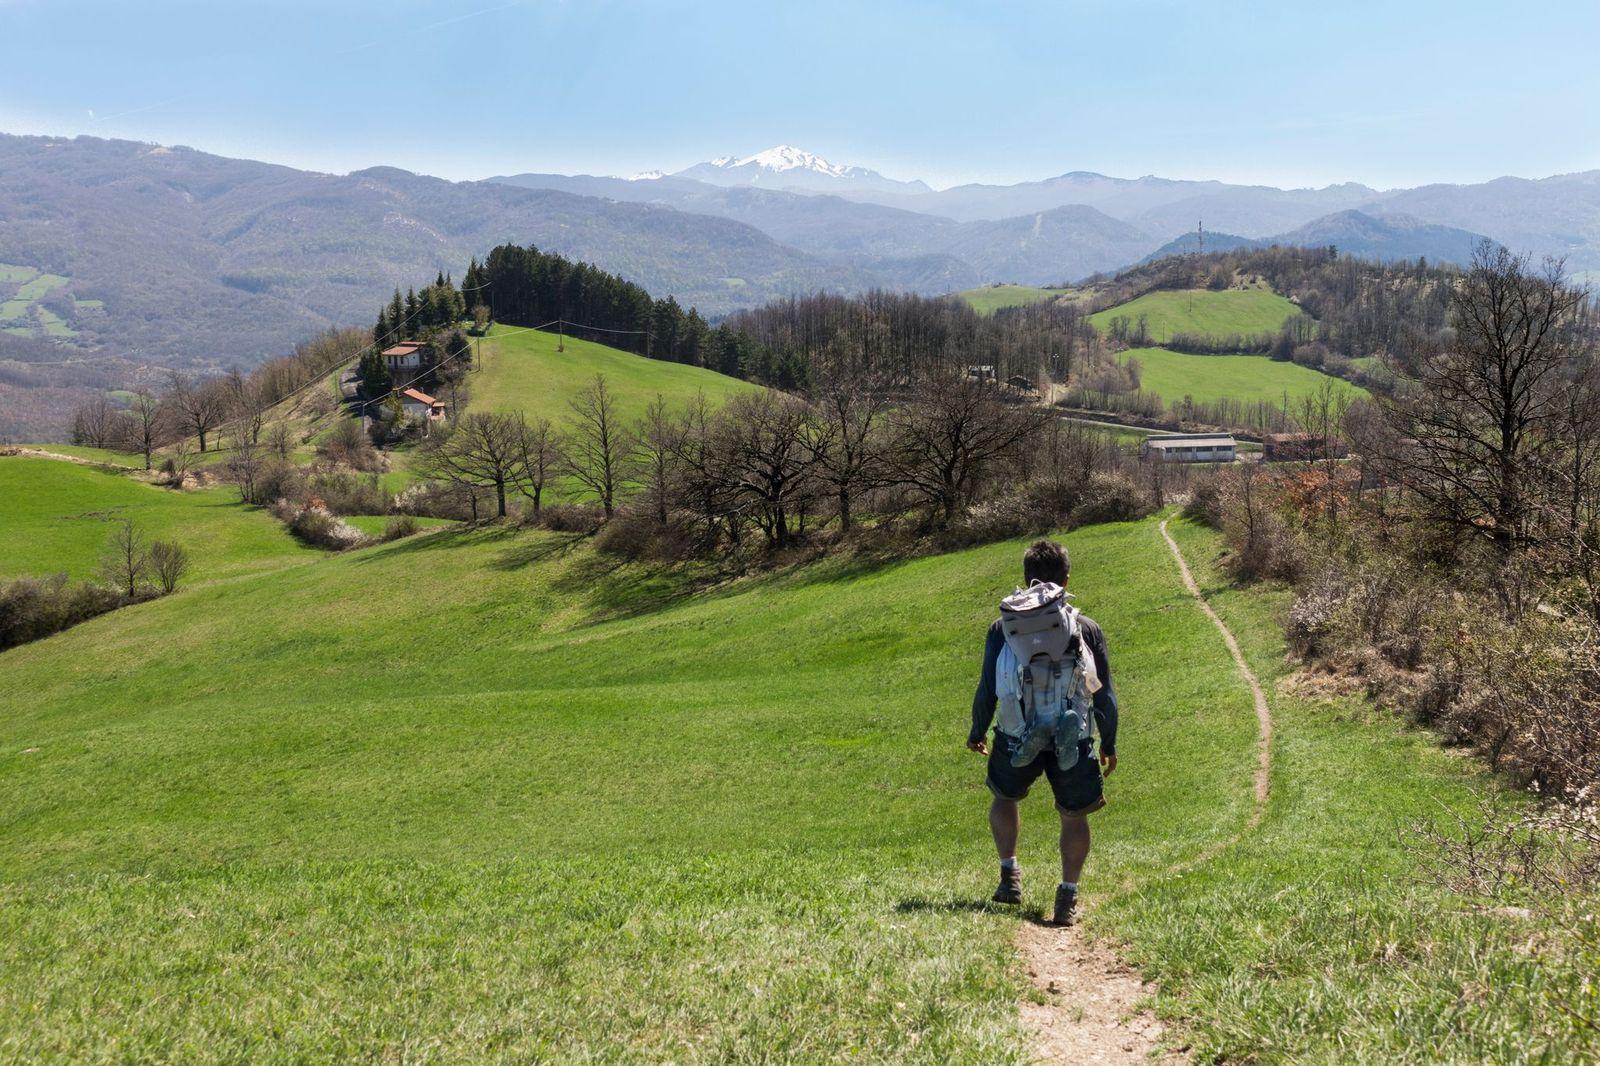 Viajar sozinho - Retrip Explora